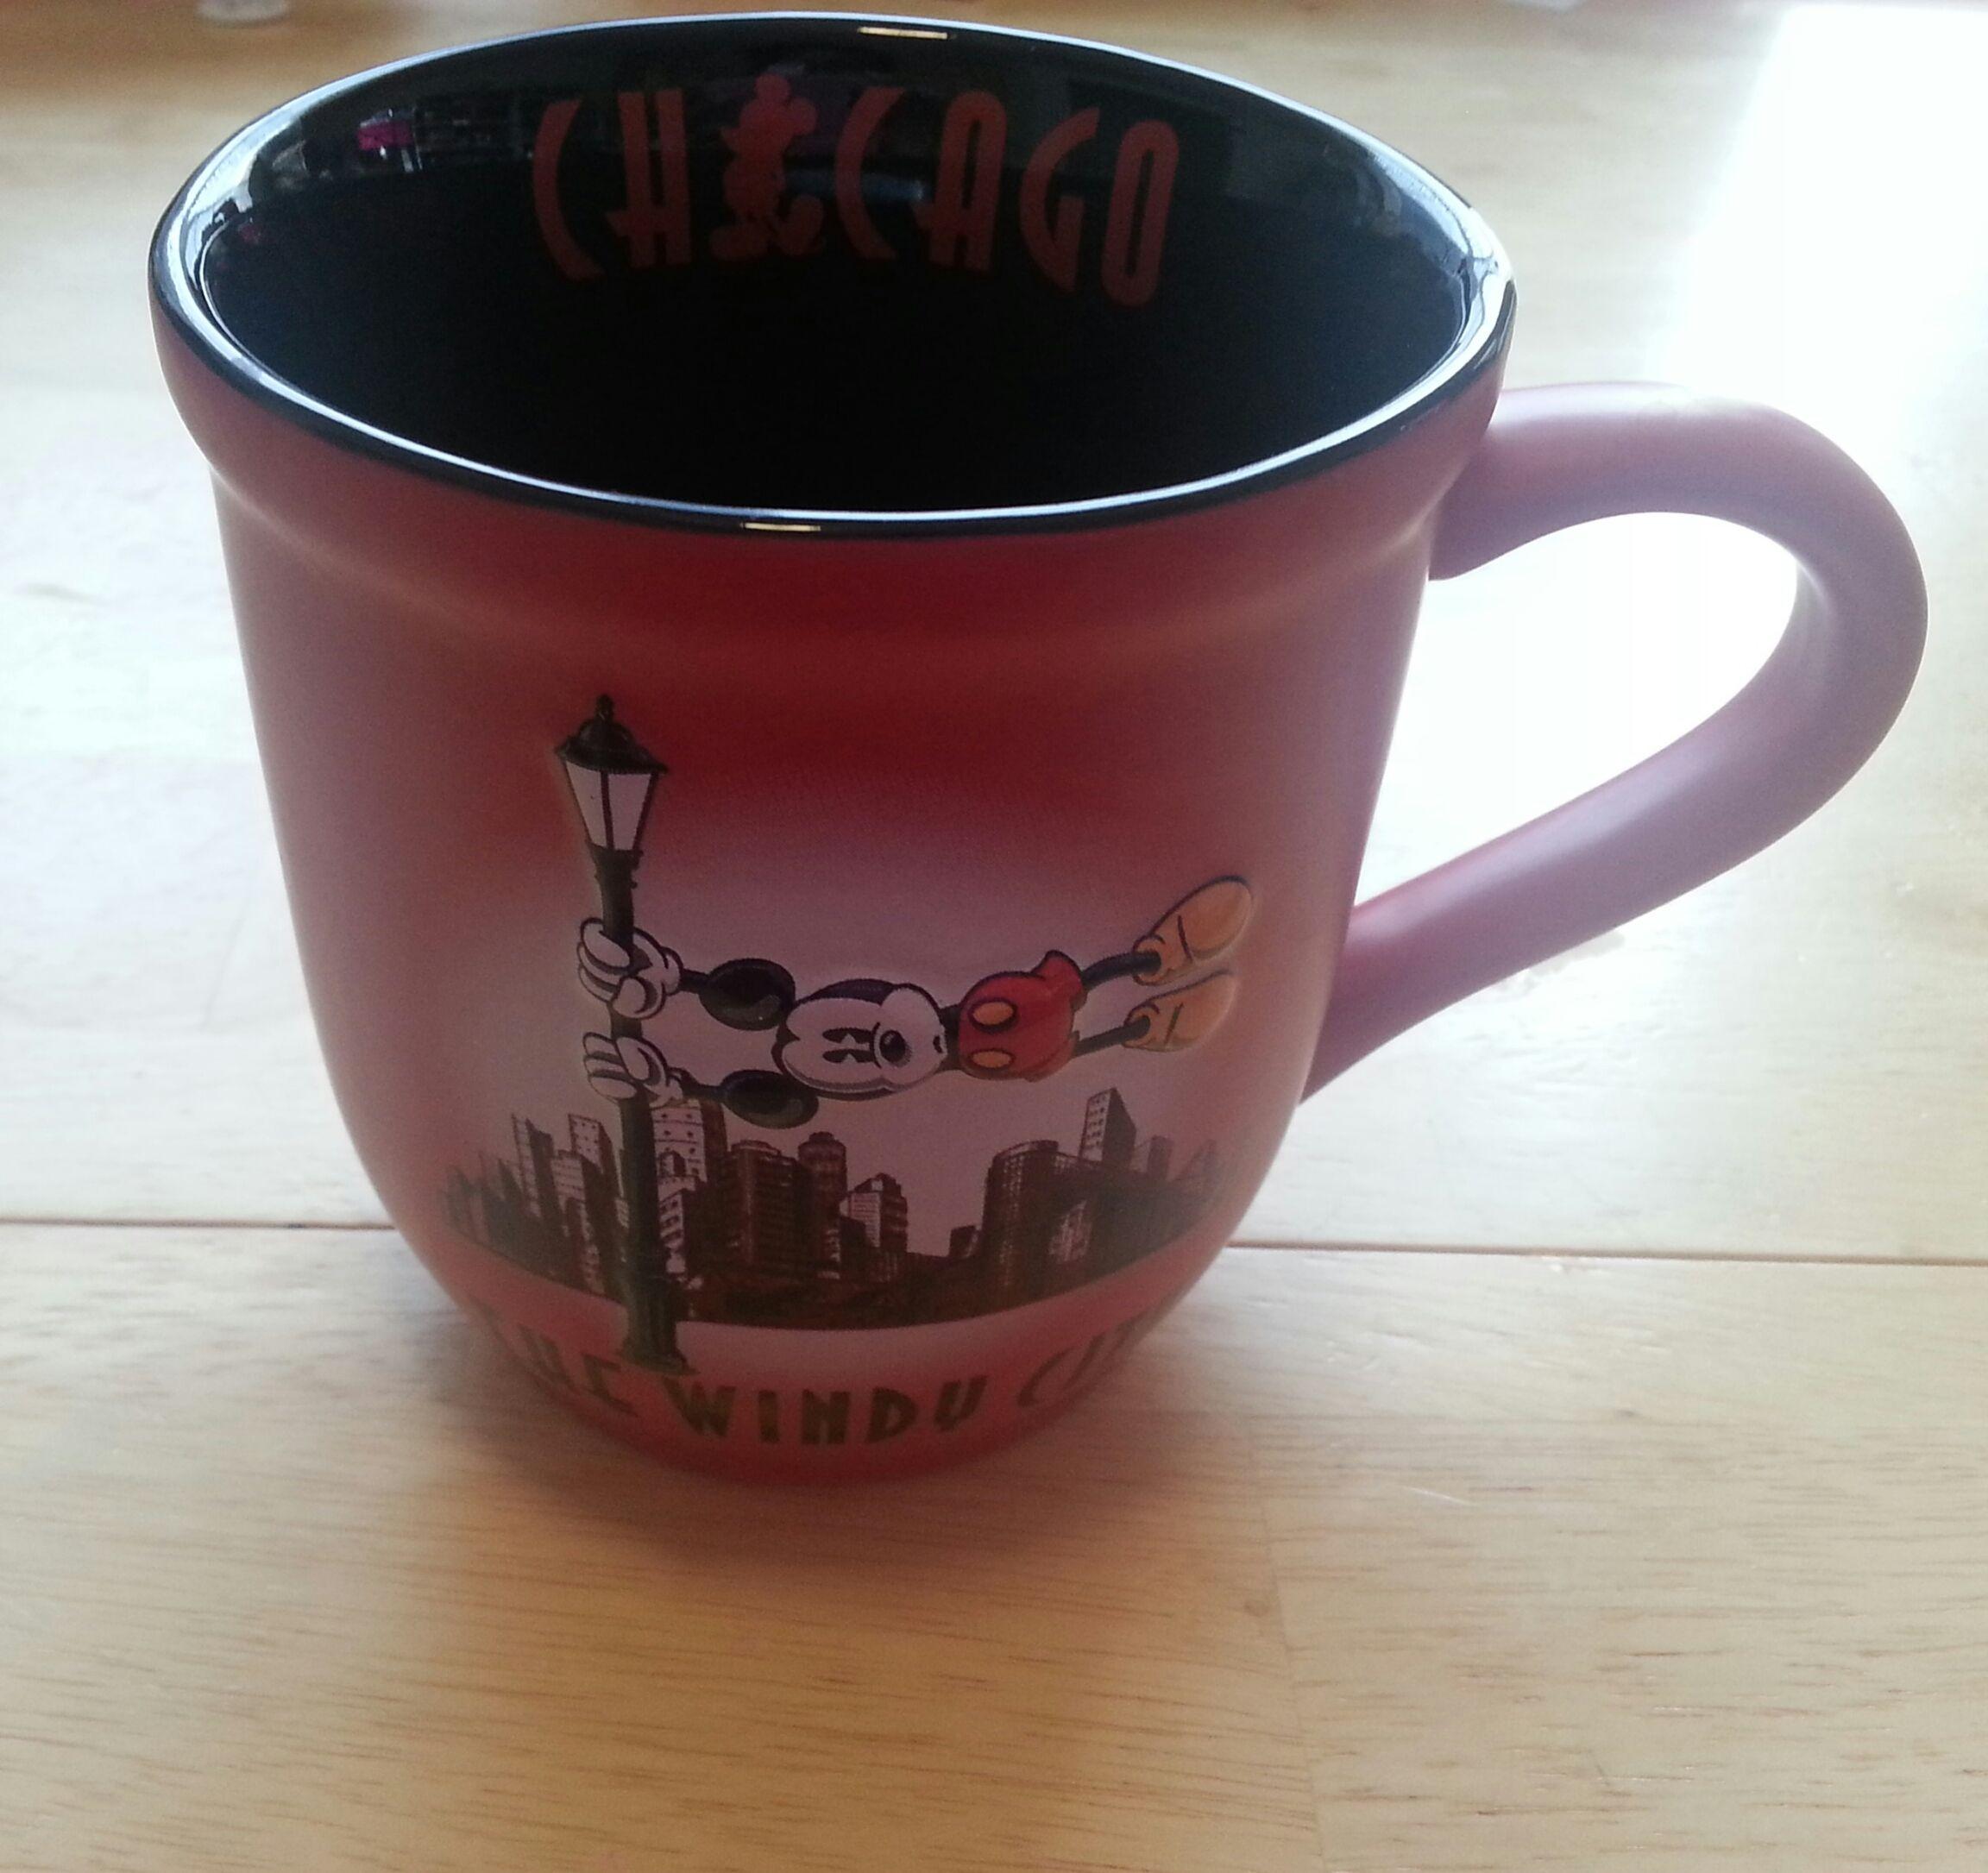 It's no just a simple mug.  #Disney #Chicago #Tea #WindyCity